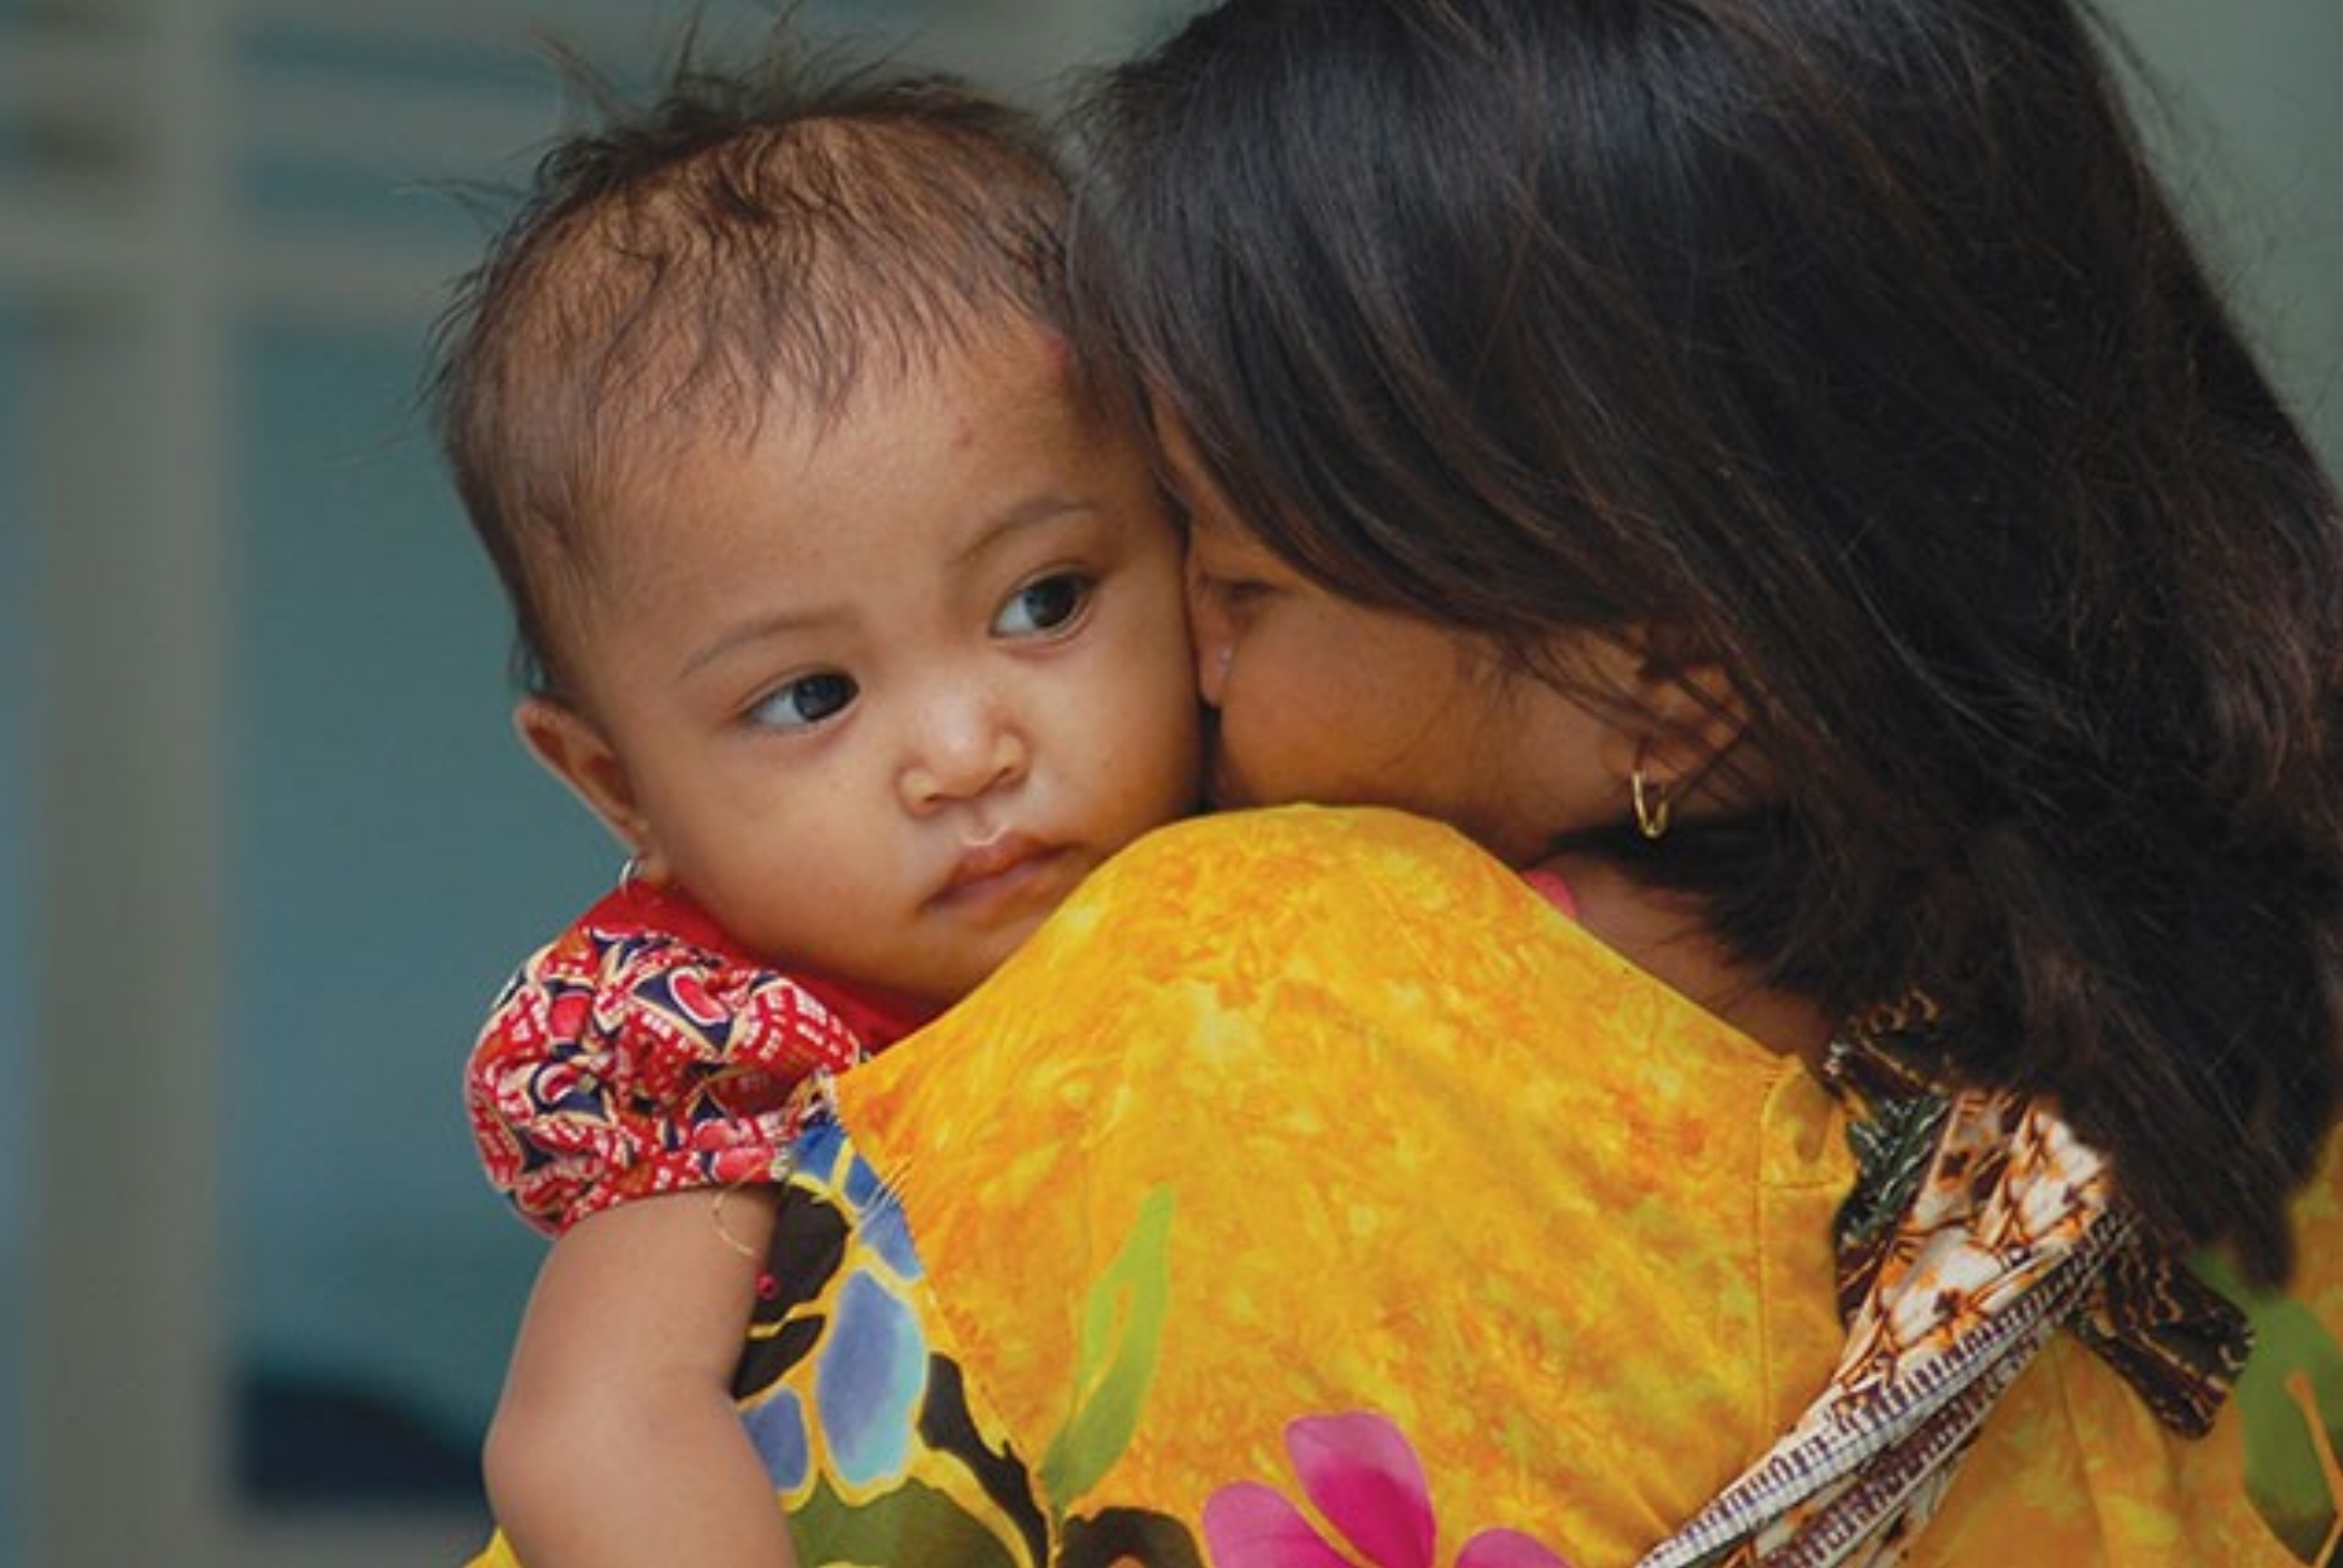 Photo: USAID